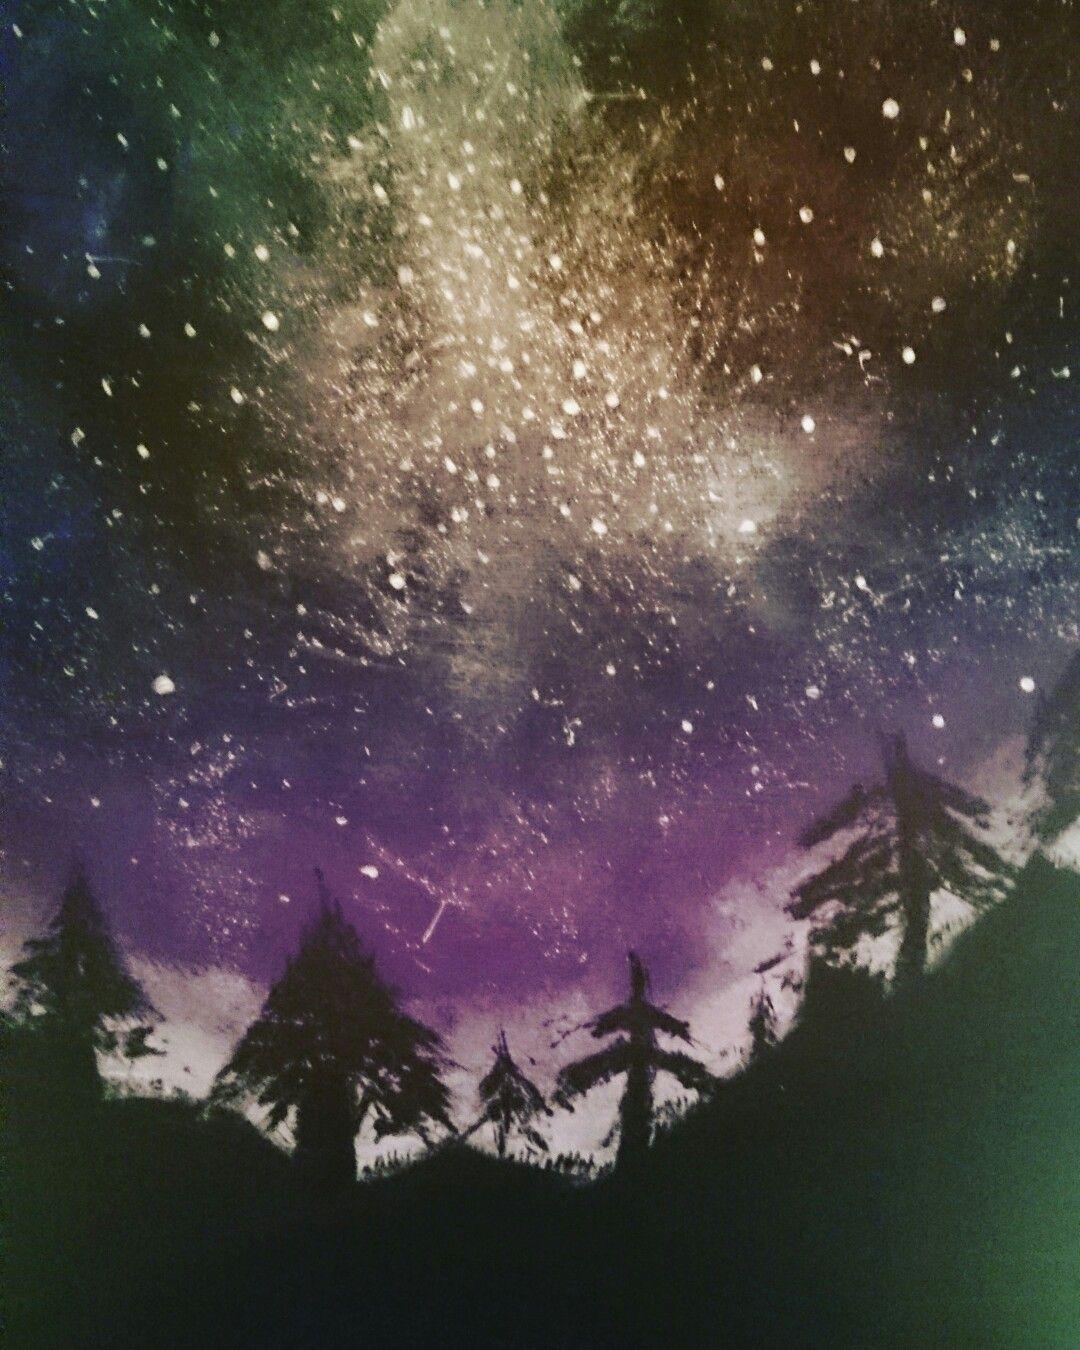 Acryl Acrylfarbe Himmel Sternenhimmel Marchenwald Sterne